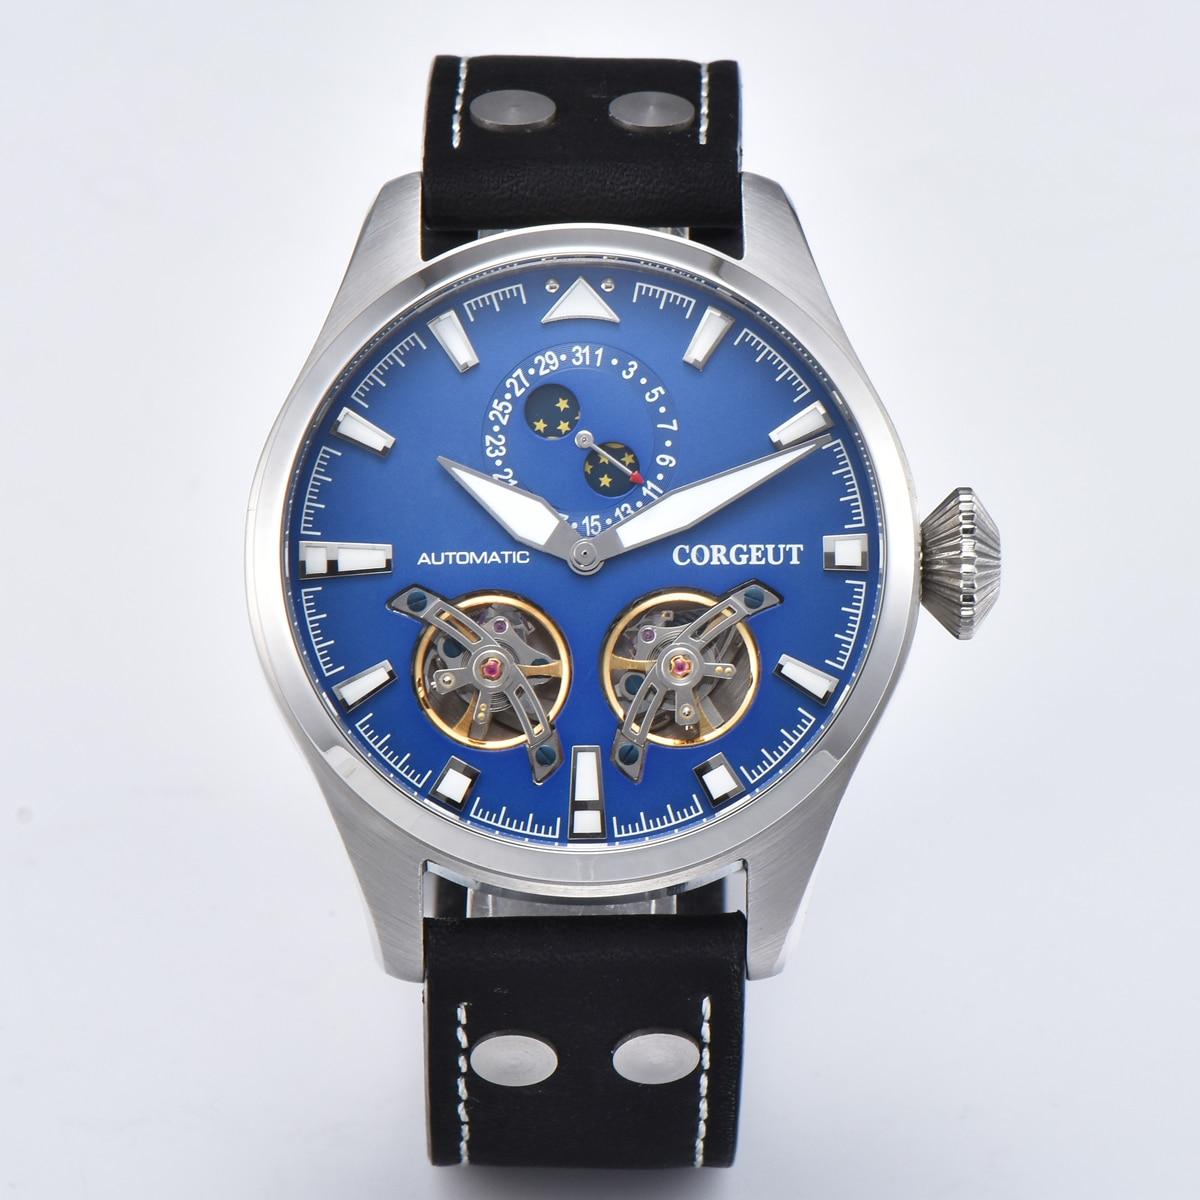 47mm Corgeut volante mecánico automático reloj esfera azul con fecha luminosa